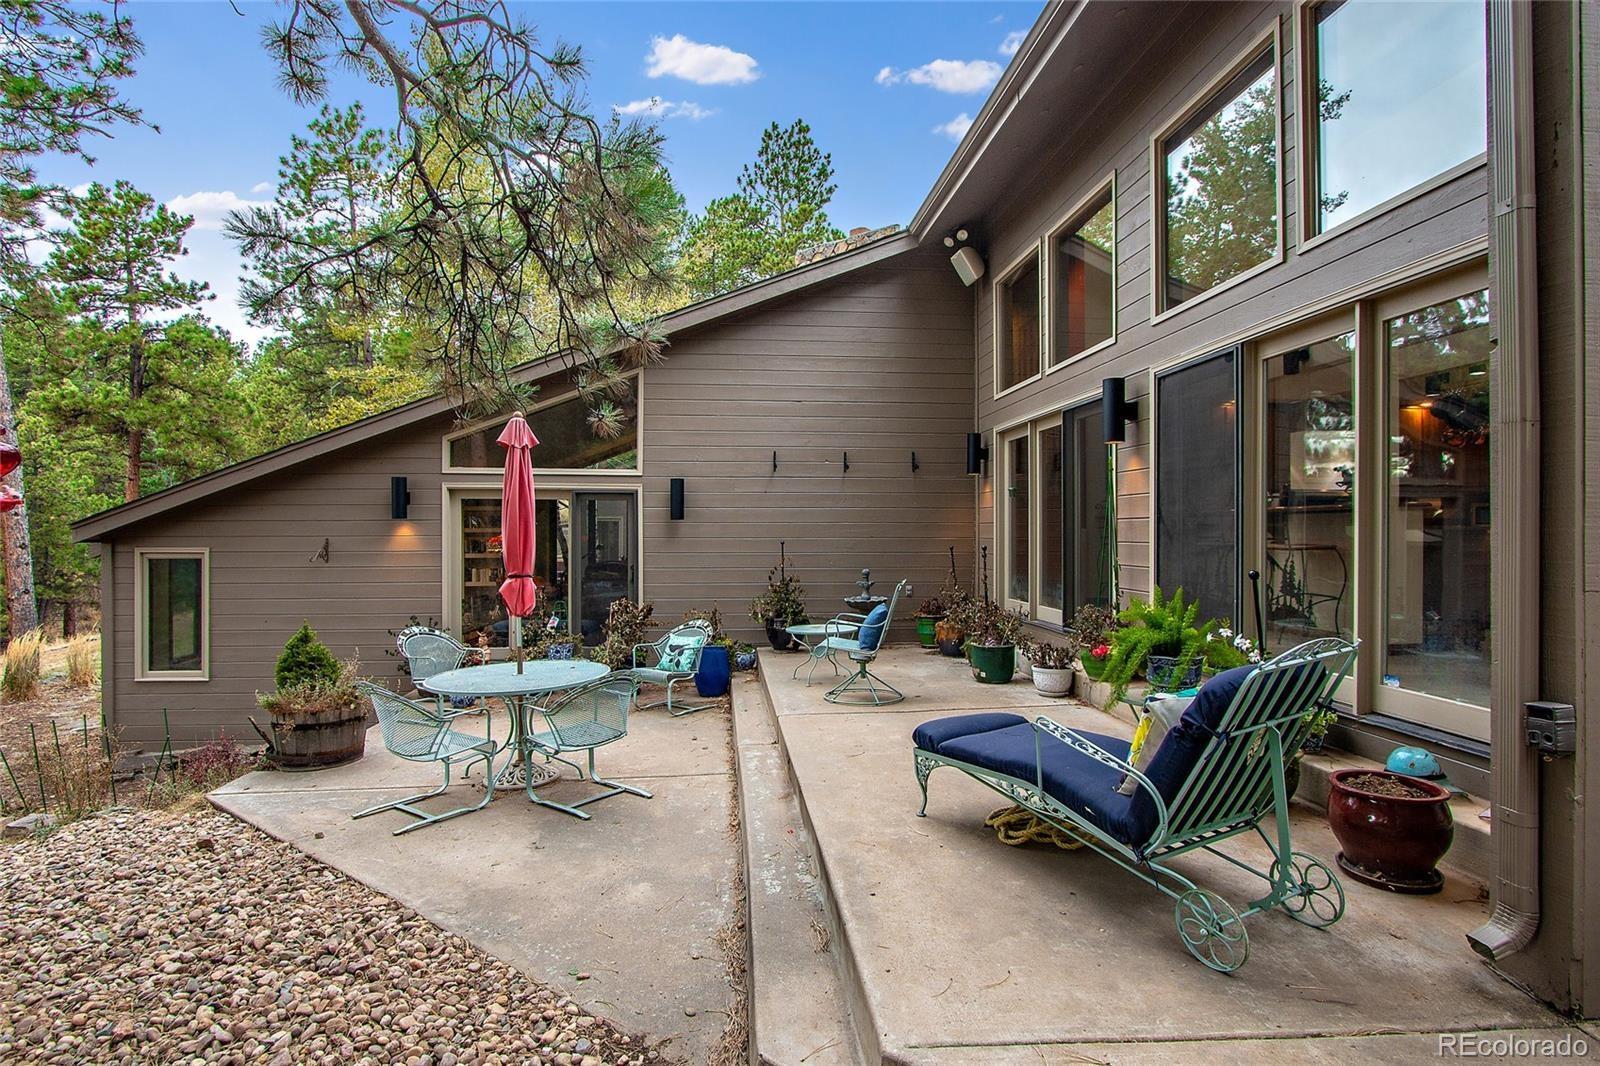 MLS# 1902527 - 27 - 29080 Pinewood Vista Drive, Evergreen, CO 80439